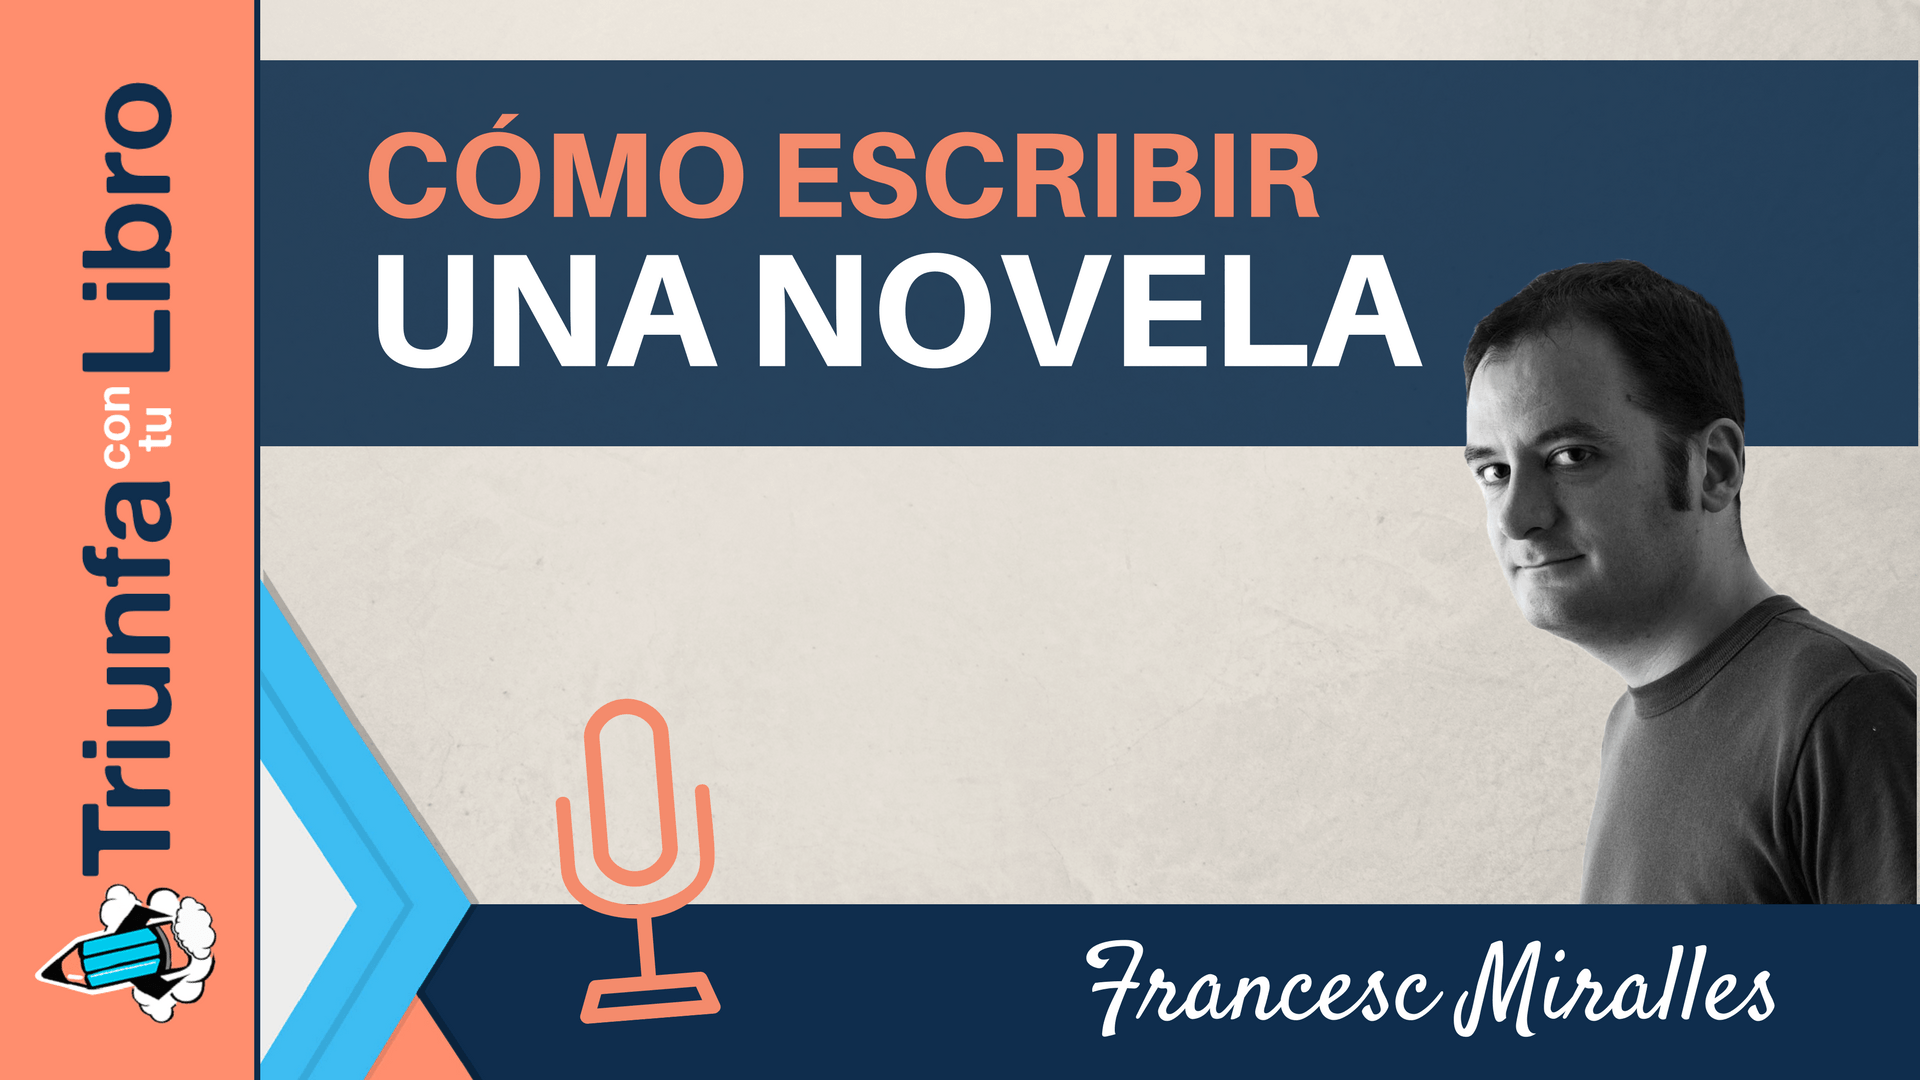 FB Cómo escribir una novela con Francesc Miralles